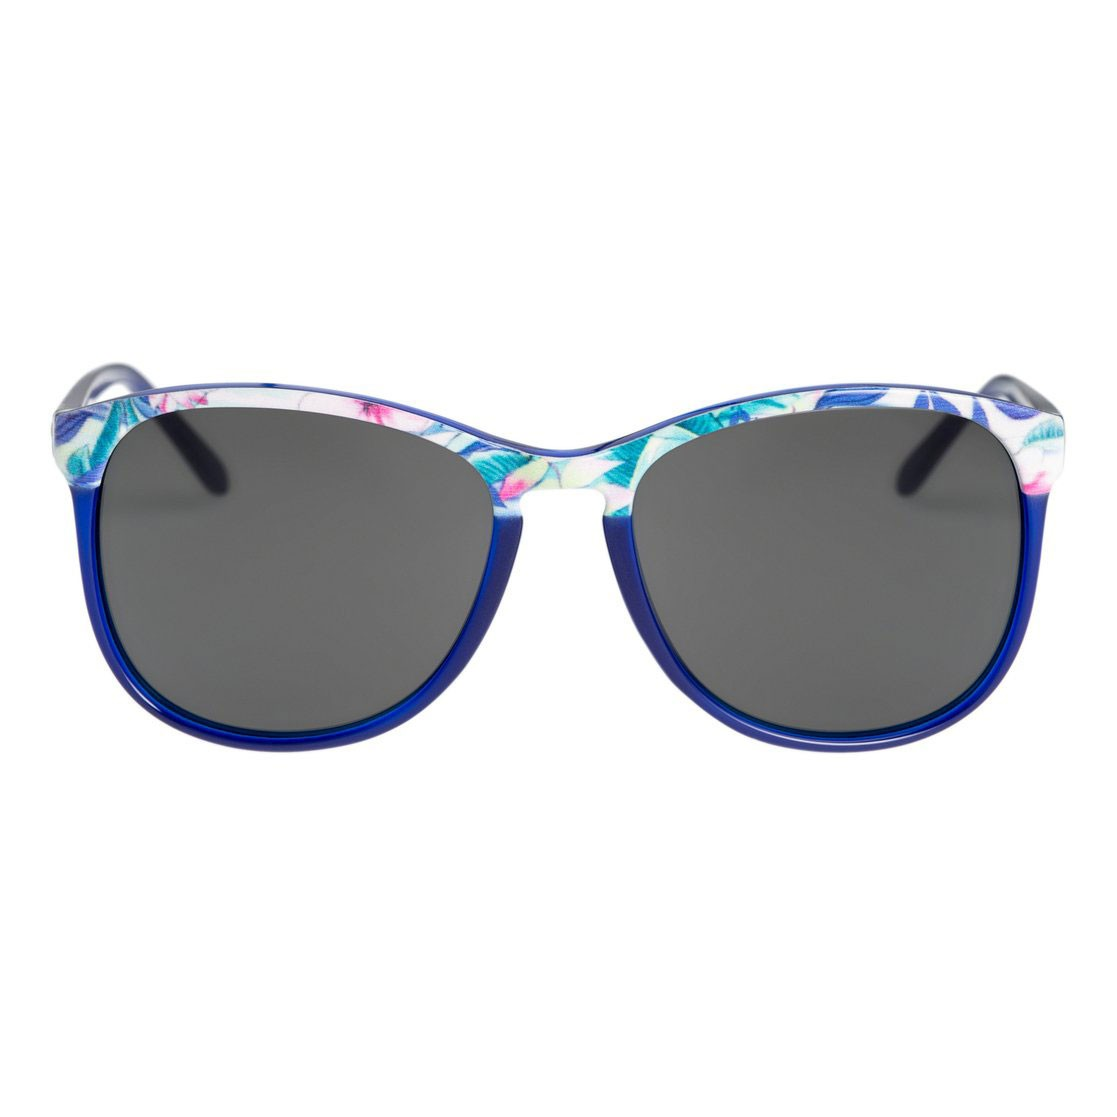 roxy sunglasses  Sunglasses Roxy Josephine navy/flower